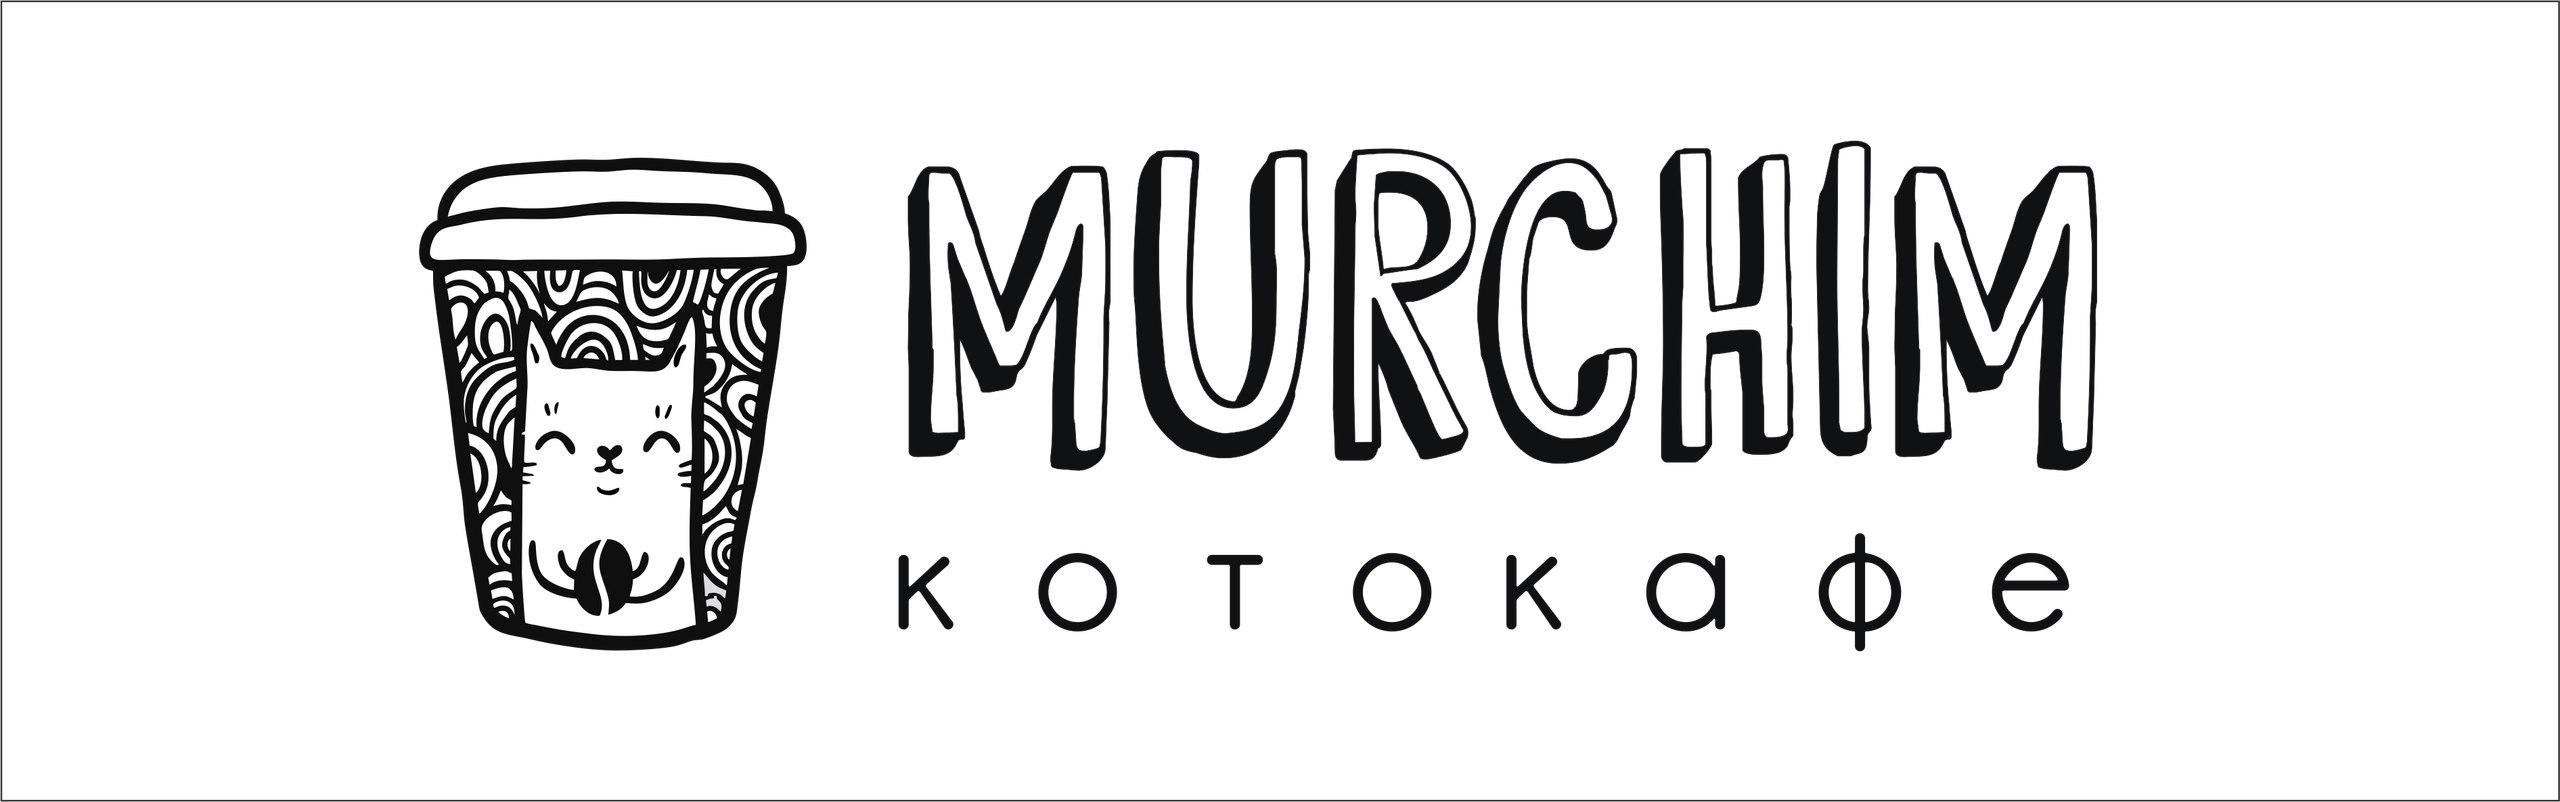 Murchim